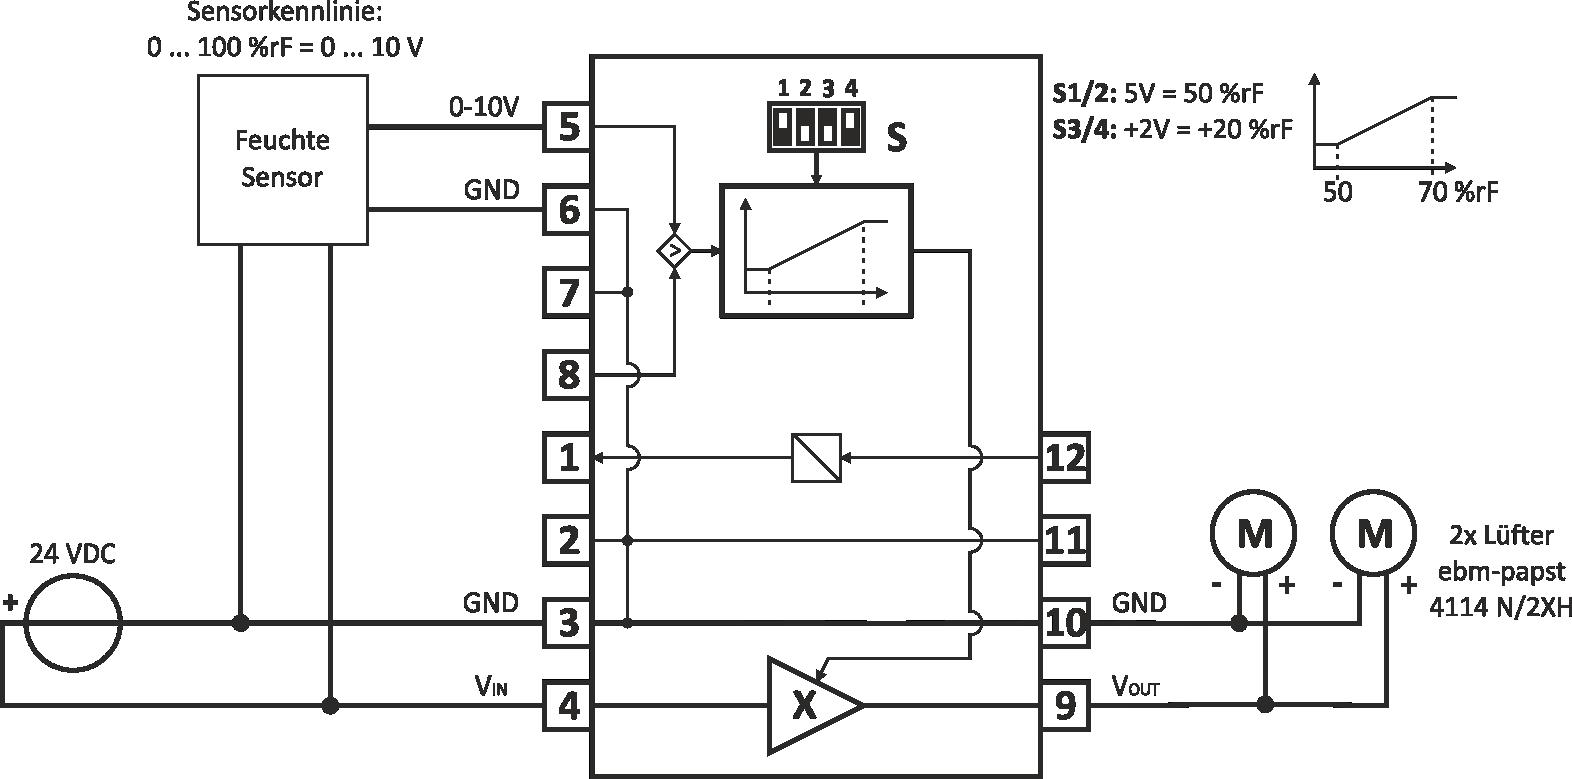 Anwendung als feuchtegeführte (rF-Sensor) Drehzahlsteuerung für zwei ebm-papst Lüfter